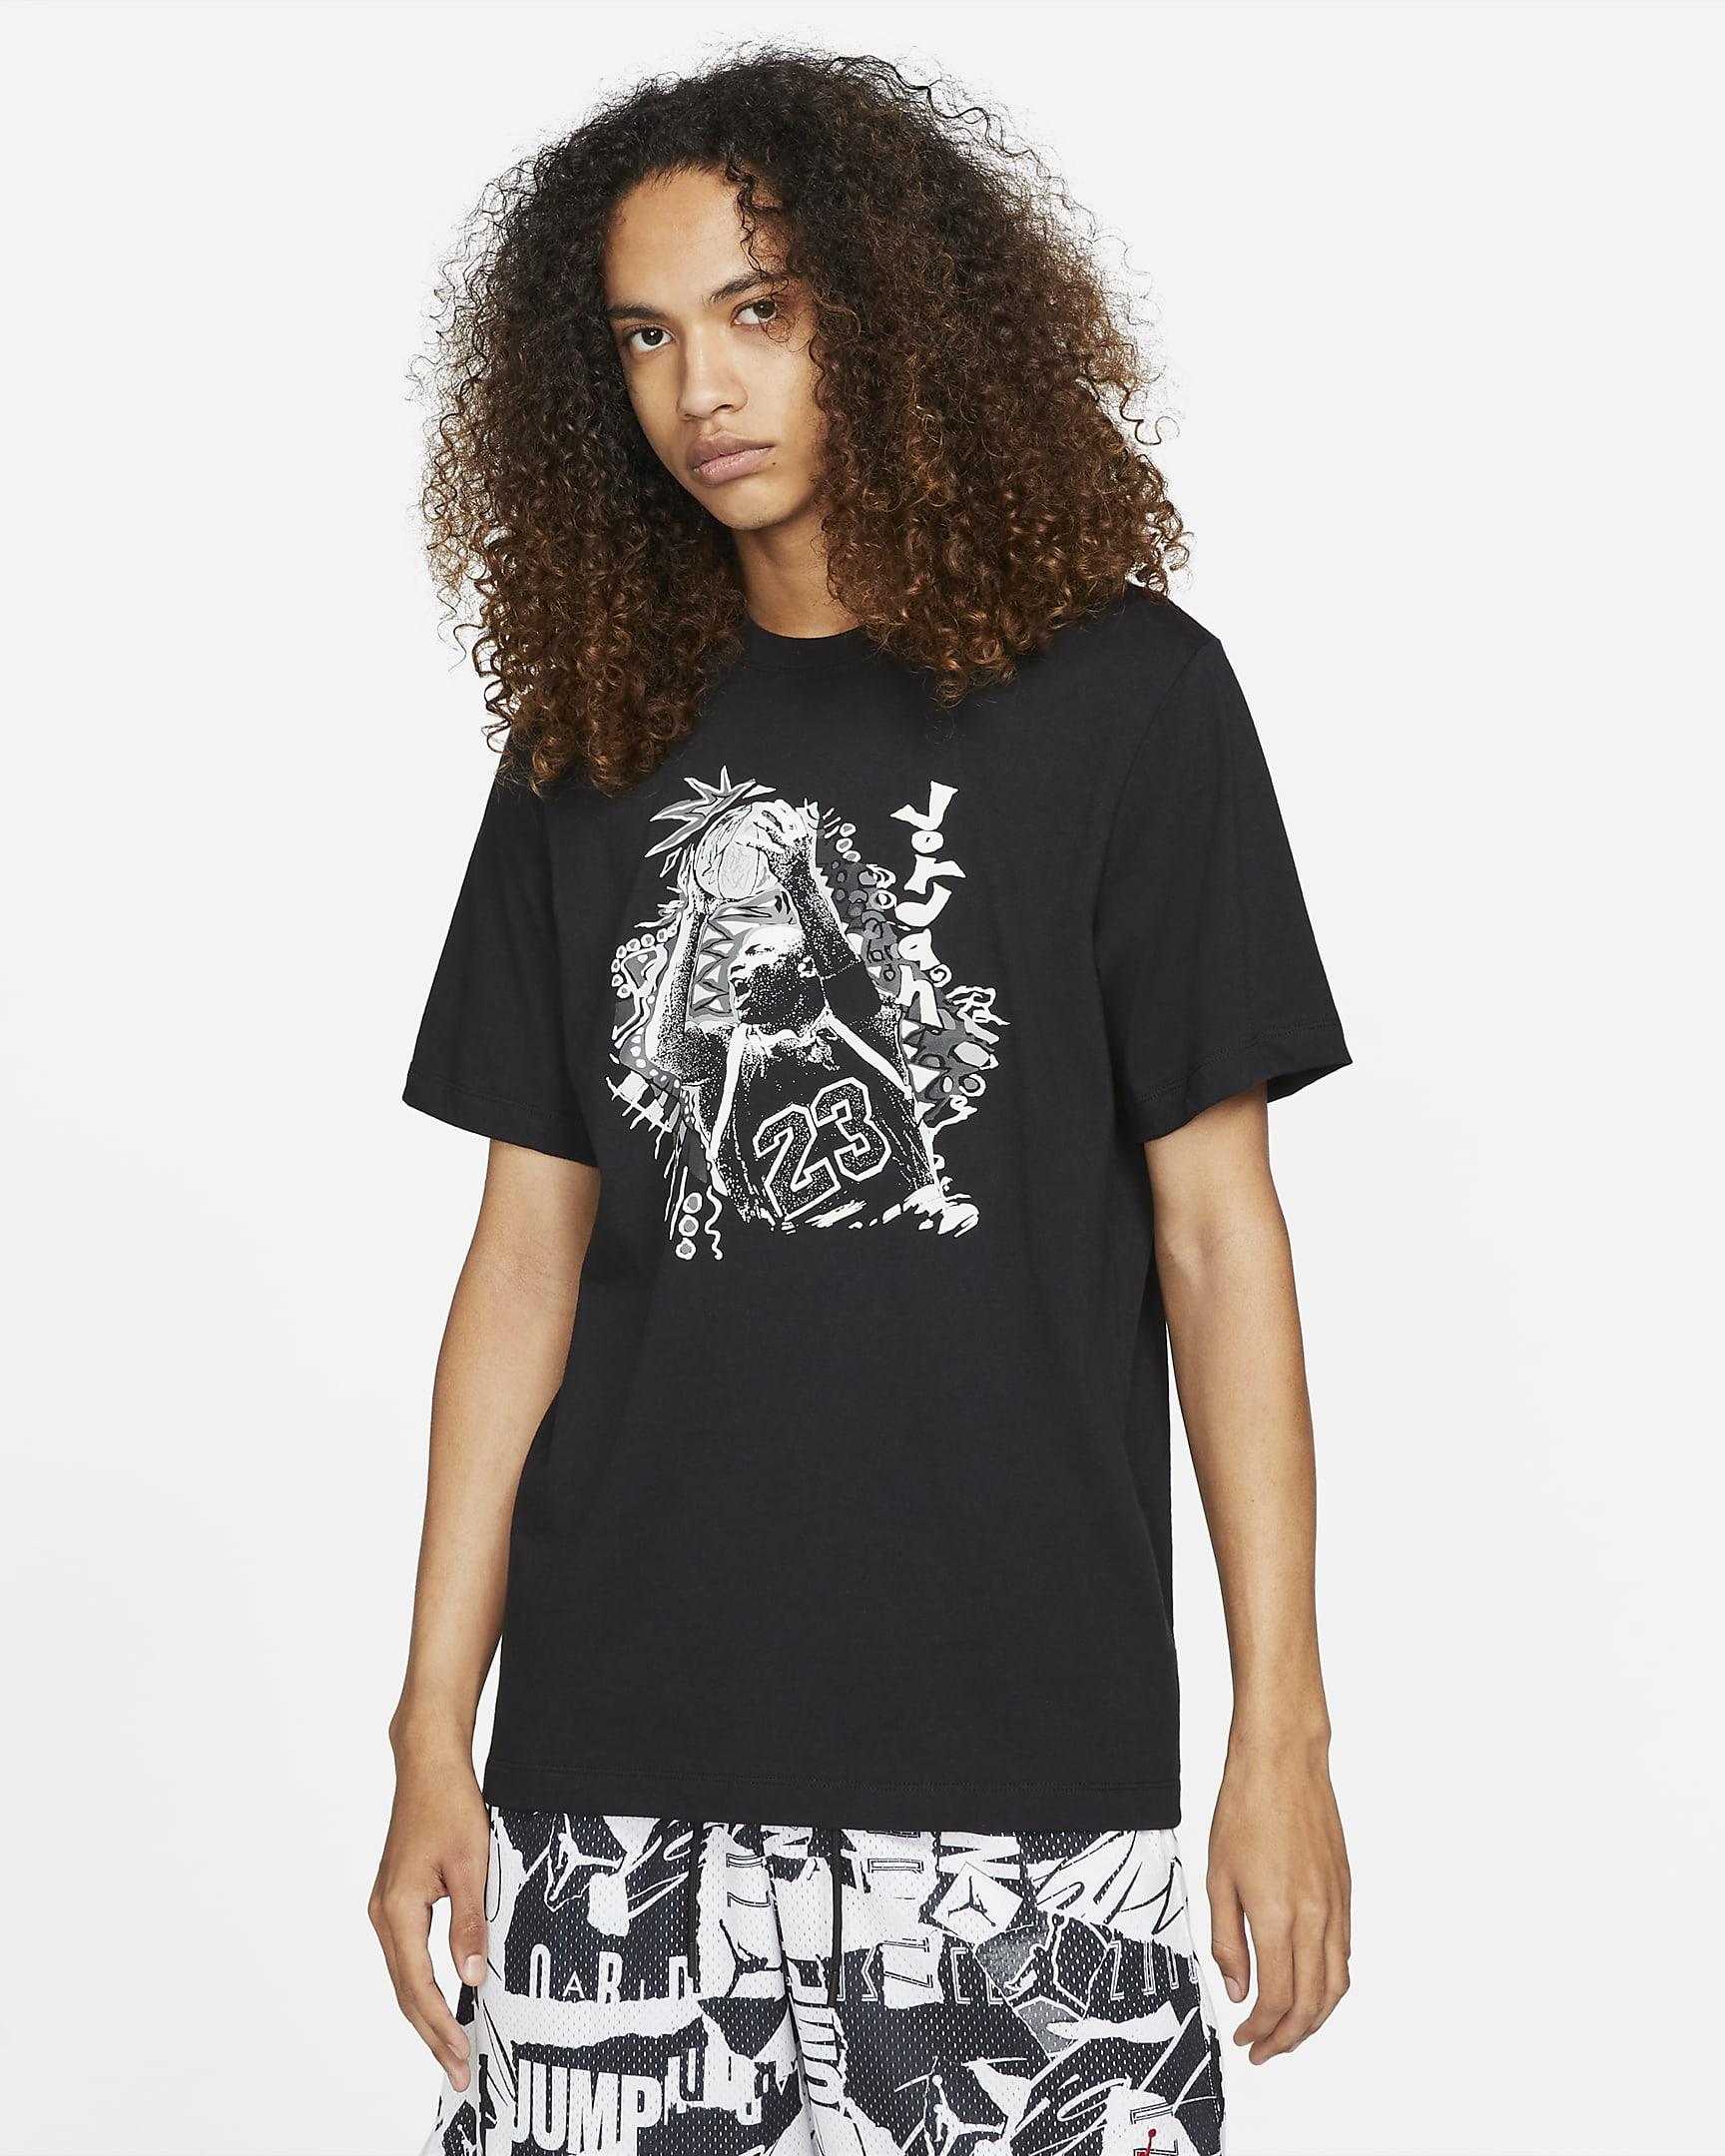 jordan-vintage-mens-graphic-t-shirt-N42Lh8-2.png